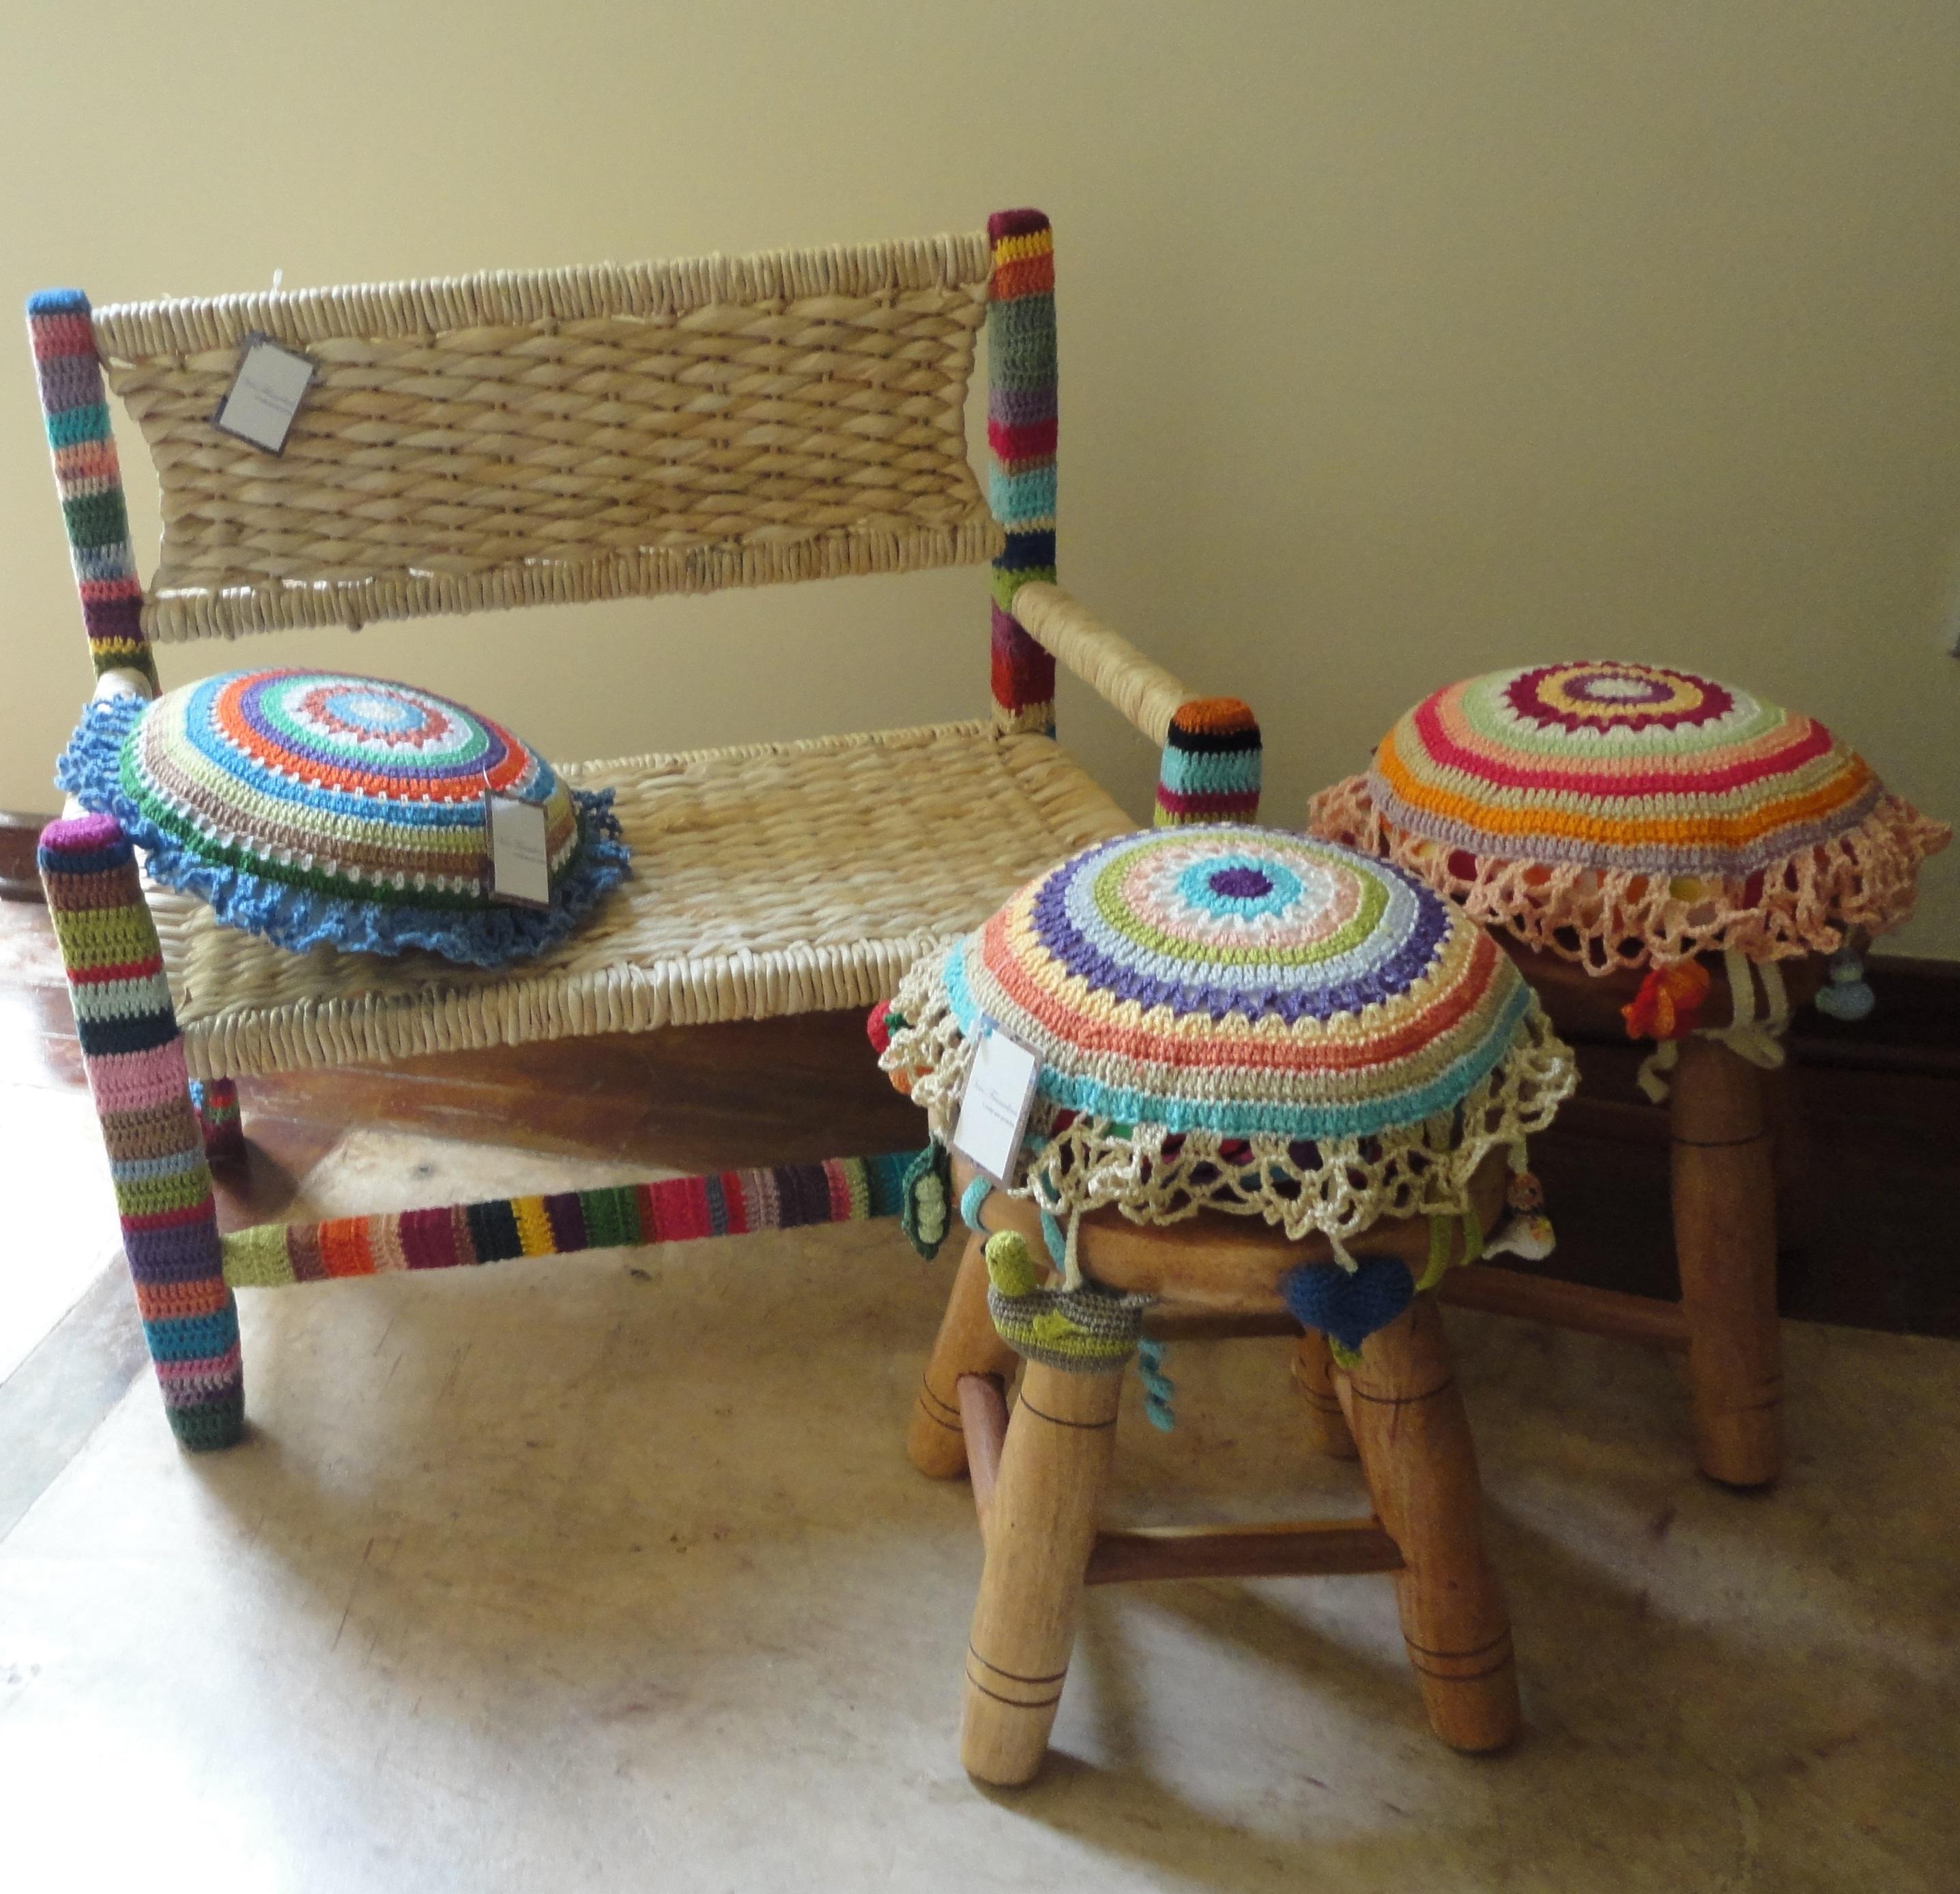 banco infantil com croche palha banco infantil com croche madeira #378094 2872x2776